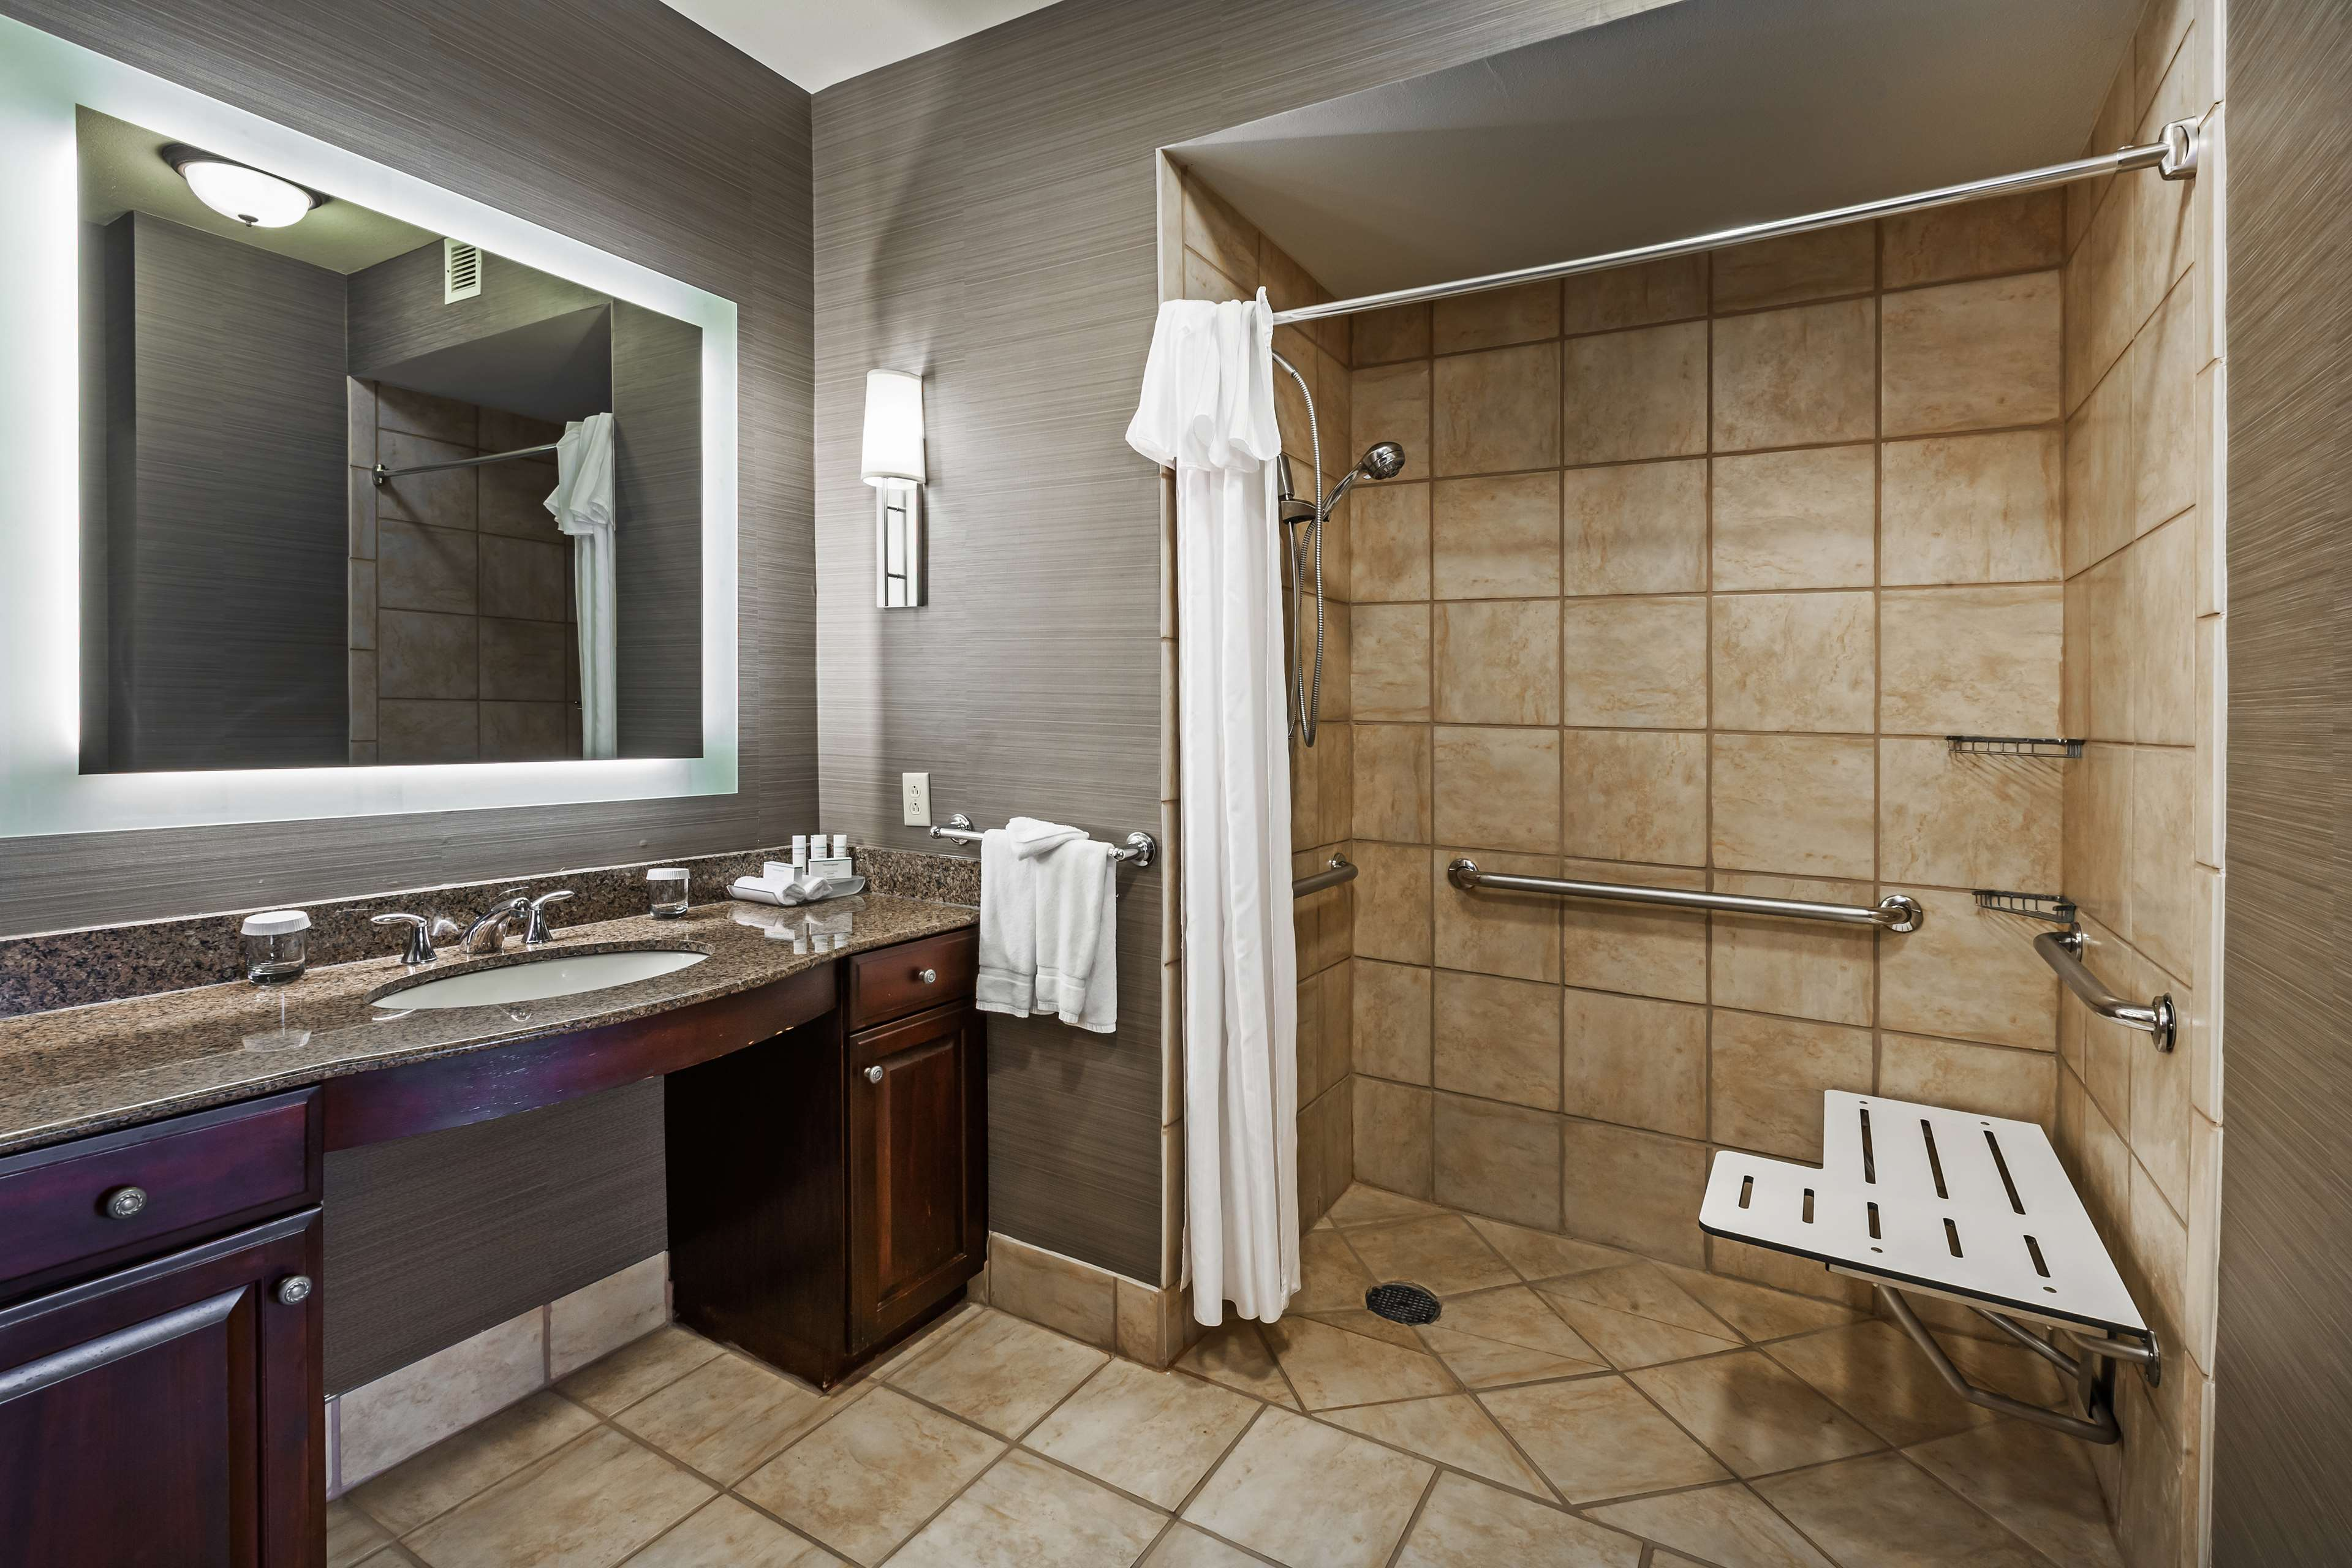 Homewood Suites by Hilton Wichita Falls image 16